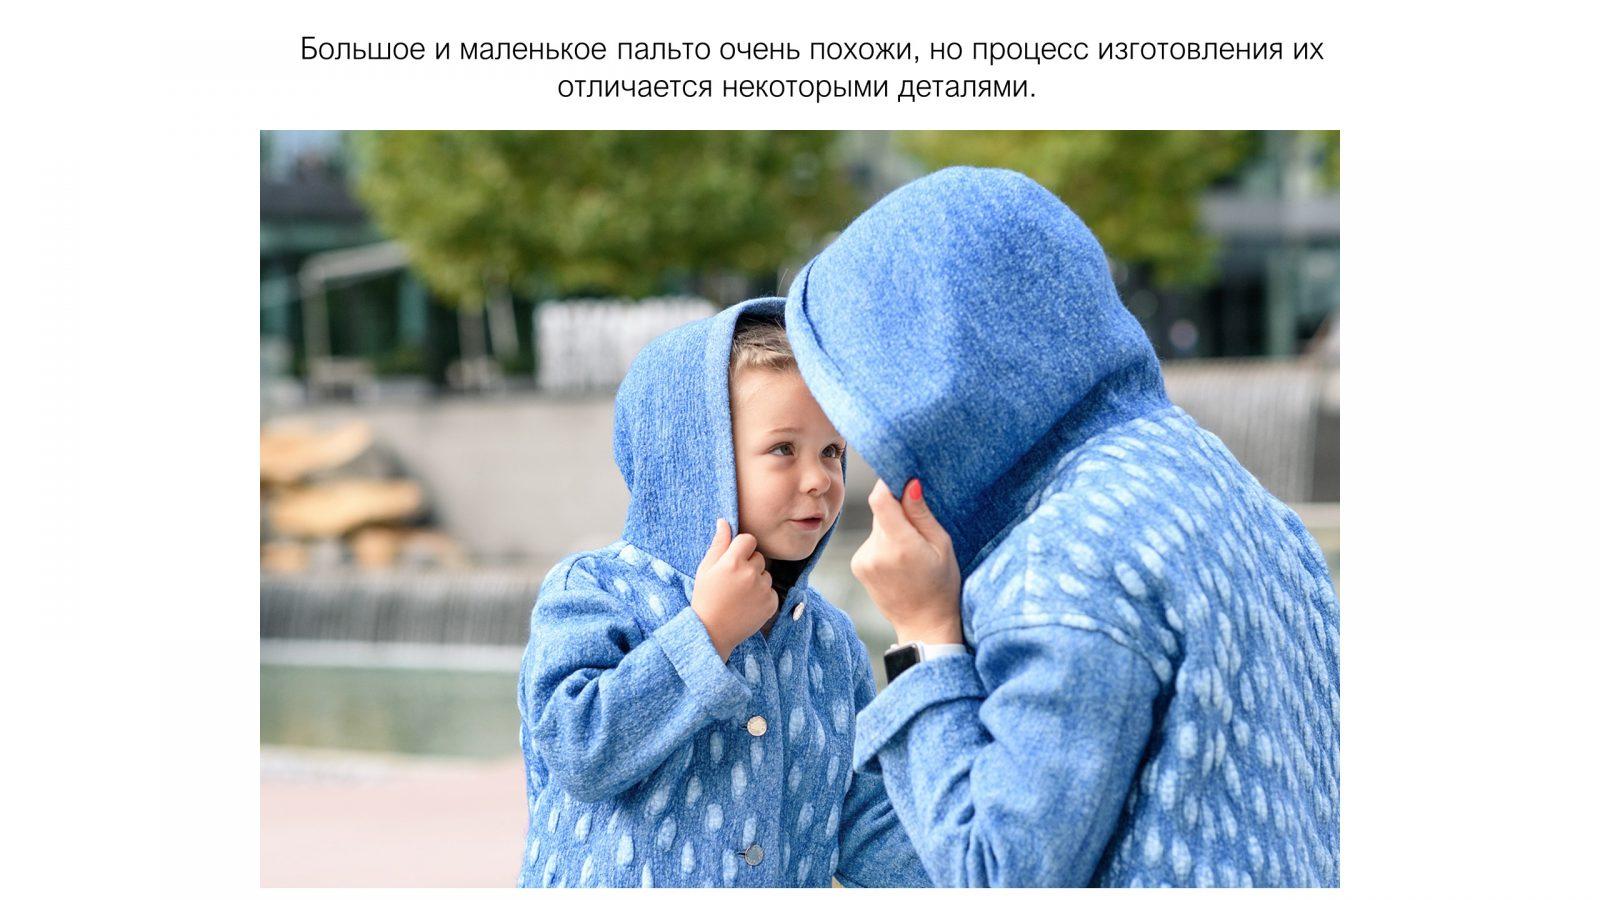 КАТЕРИНА КОРШУН. ПАЛЬТО ДОЧКИ-МАТЕРИ